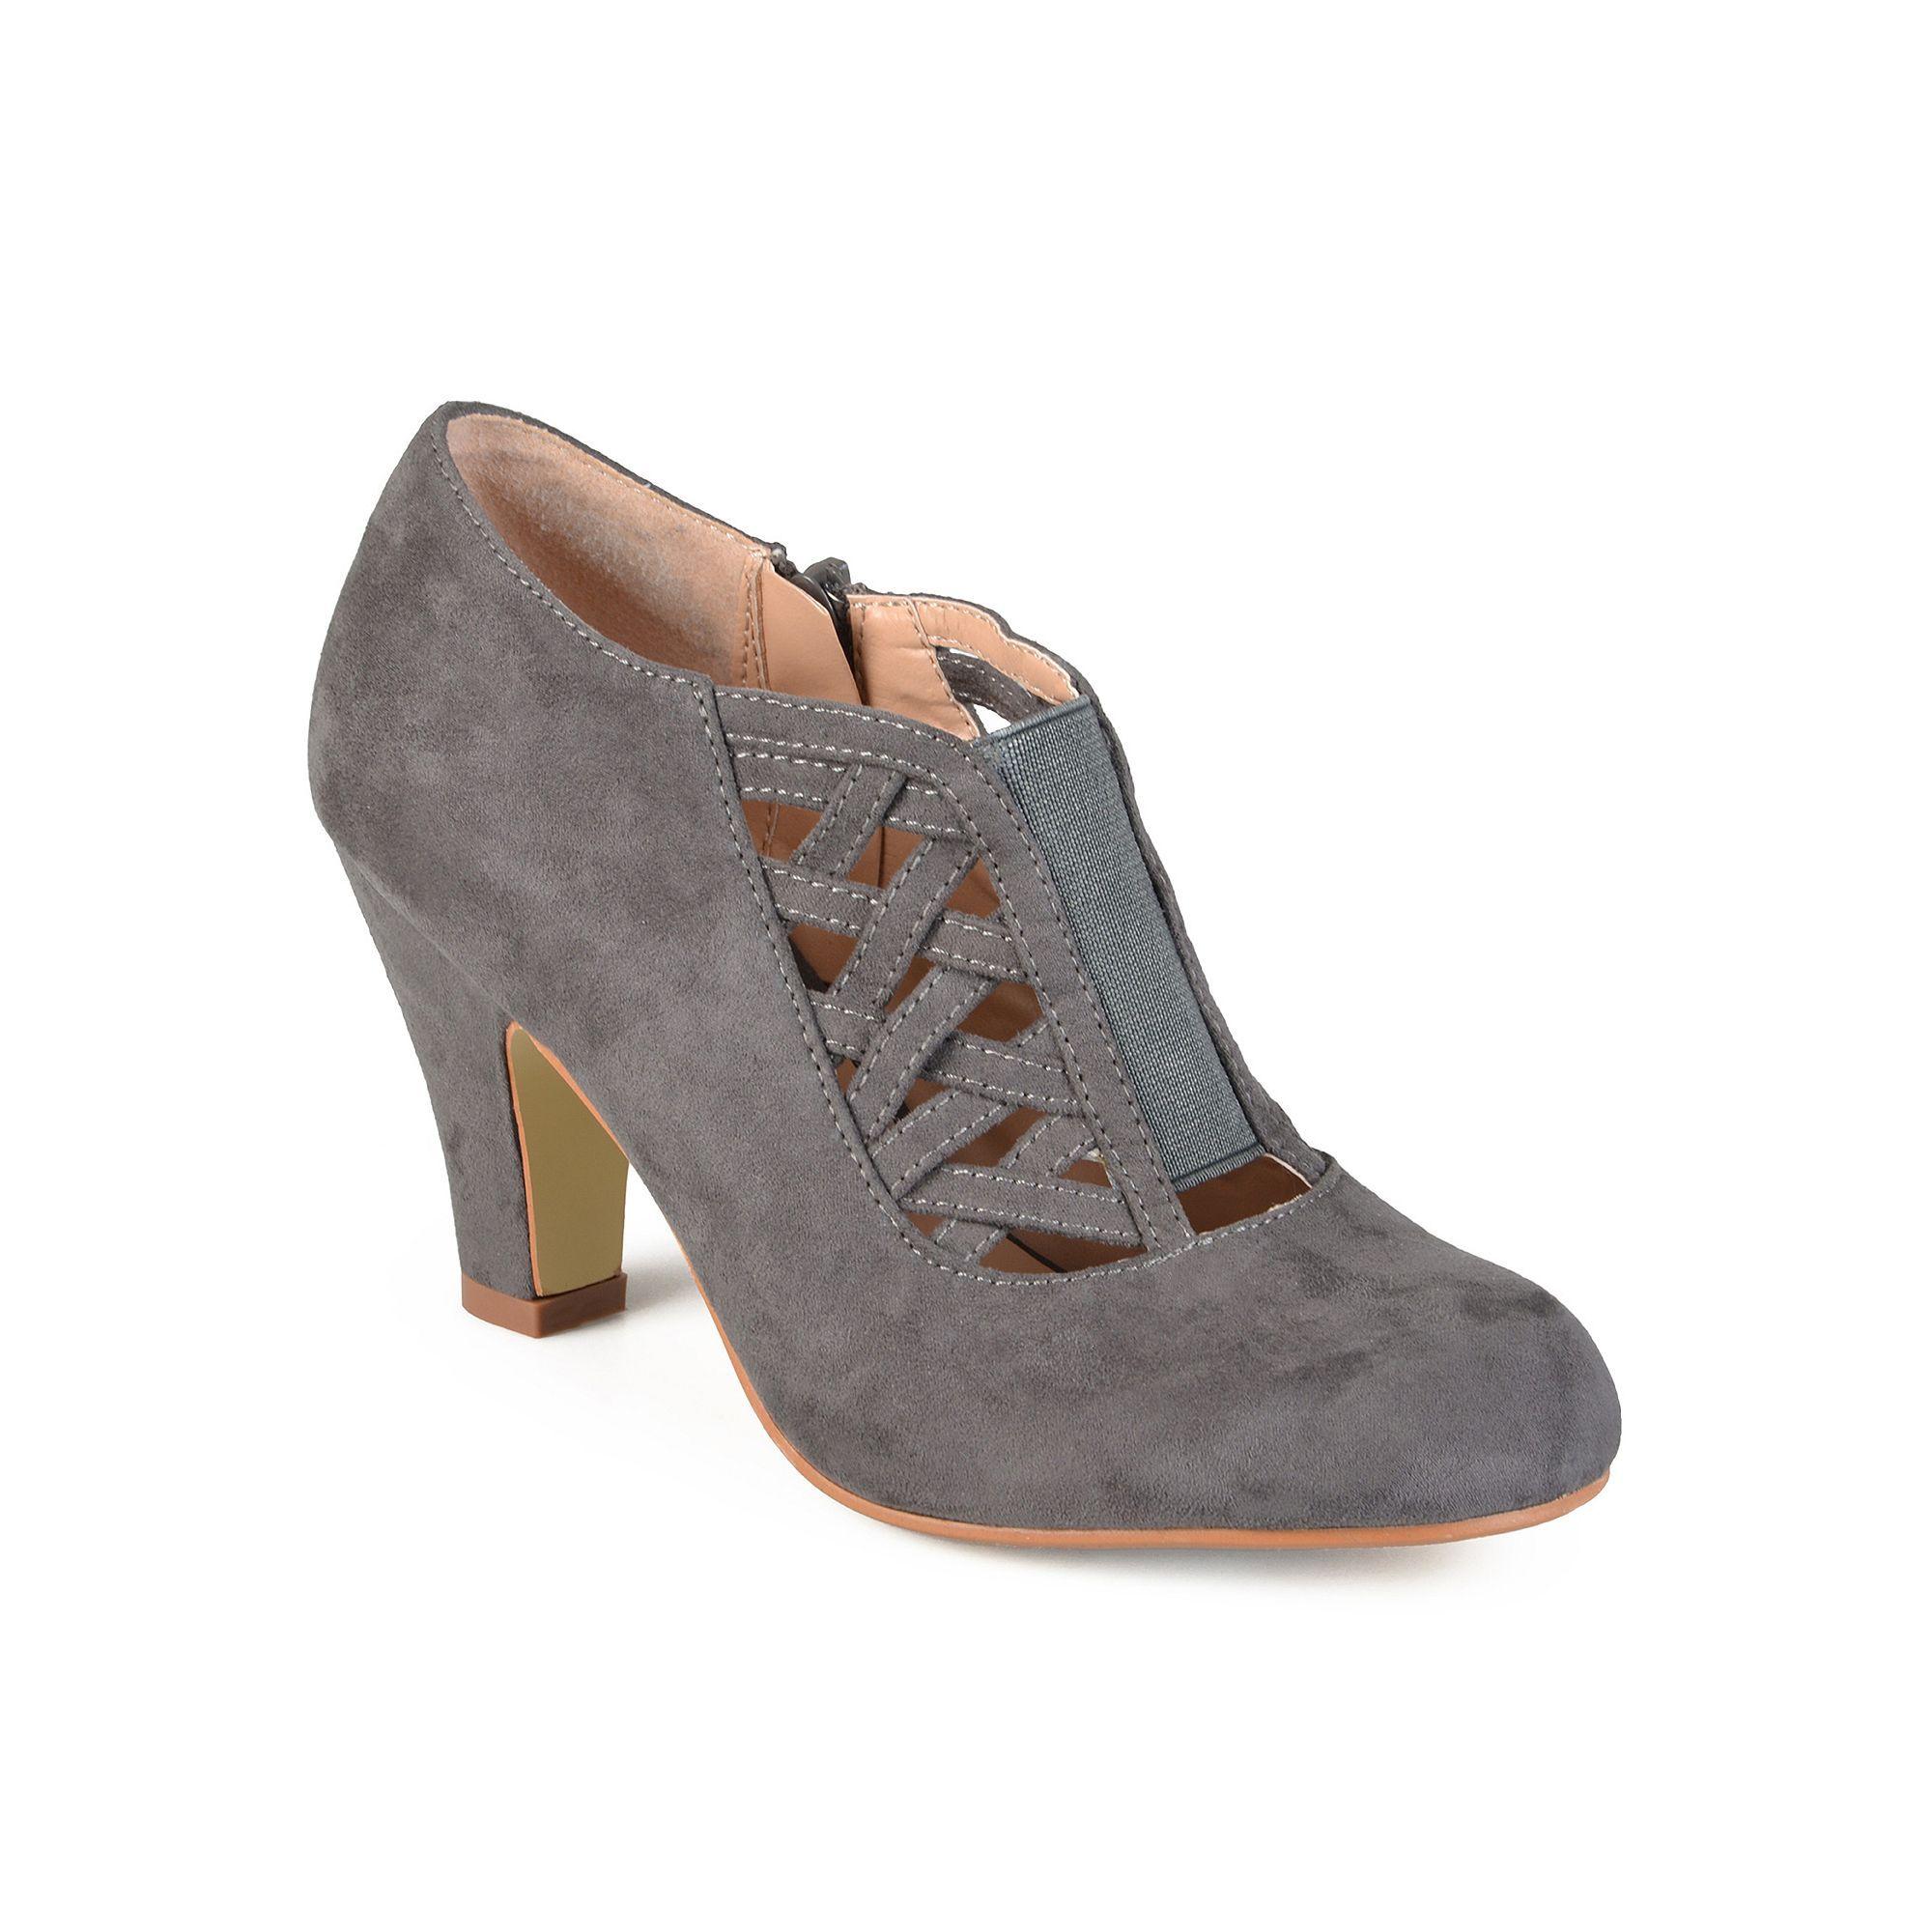 Journee Collection Piper ... Women's Ankle Pumps cheap enjoy BxnMOPMp9